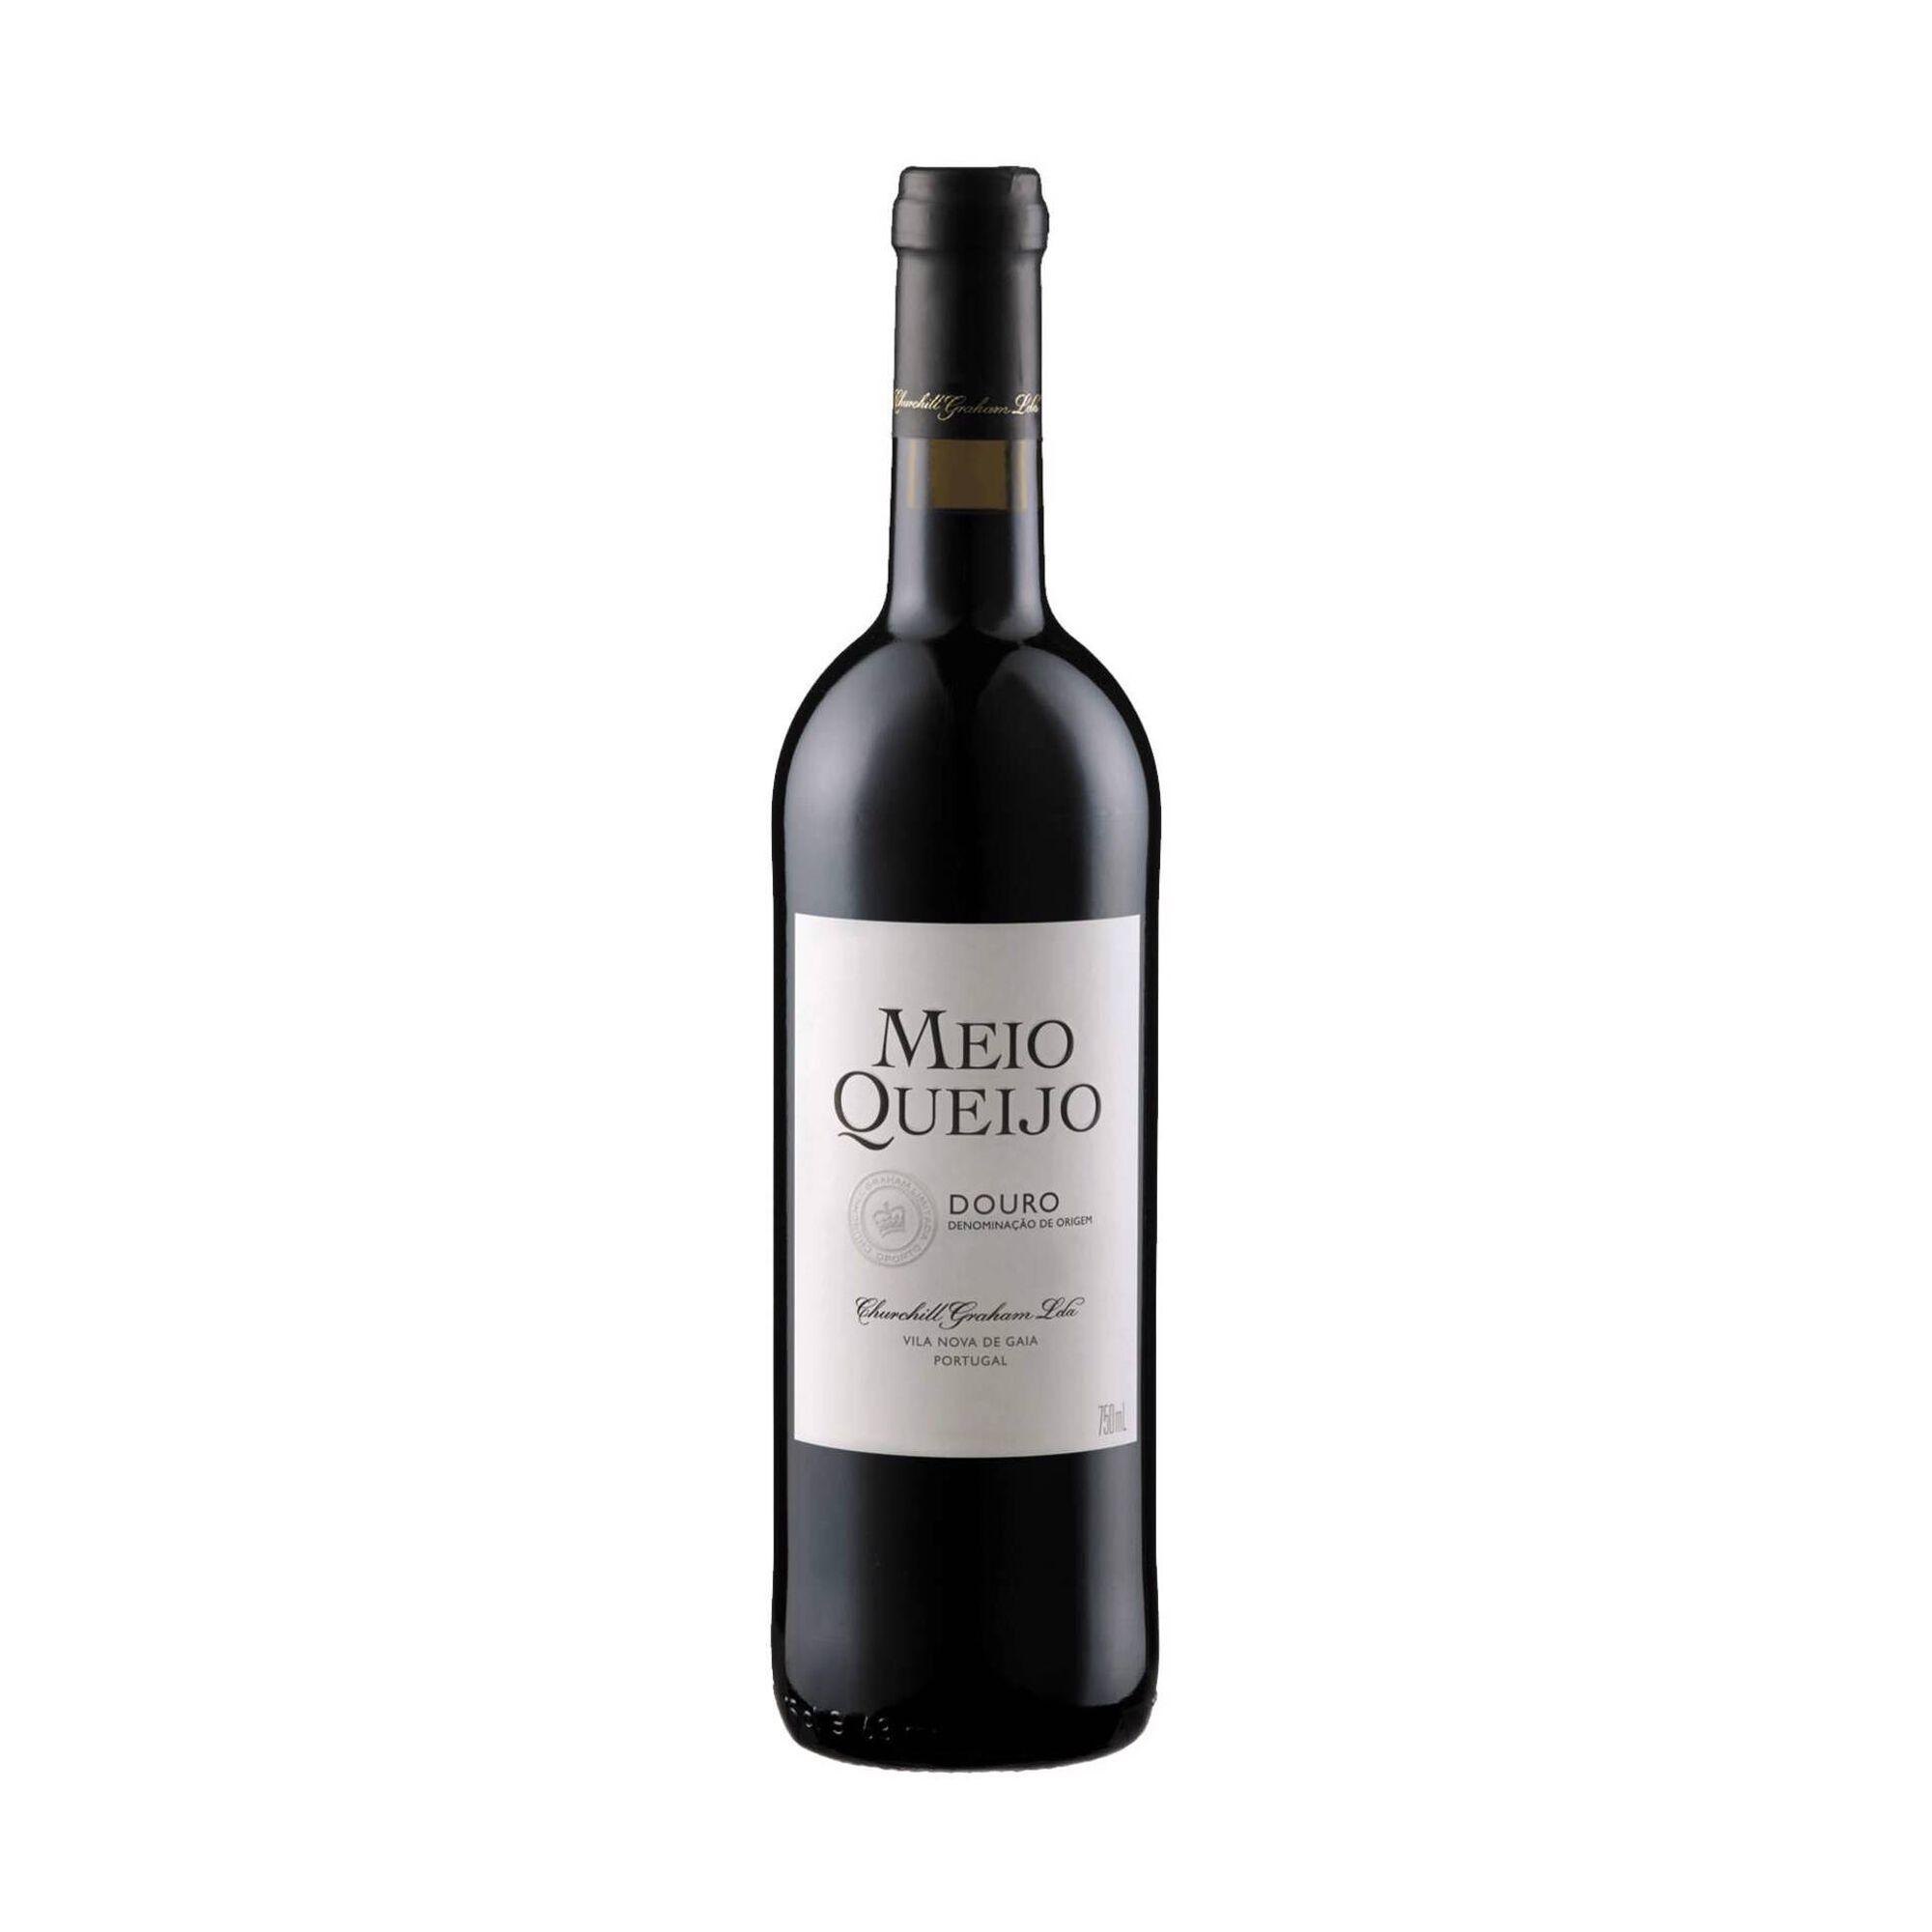 Meio Queijo DOC Douro Vinho Tinto